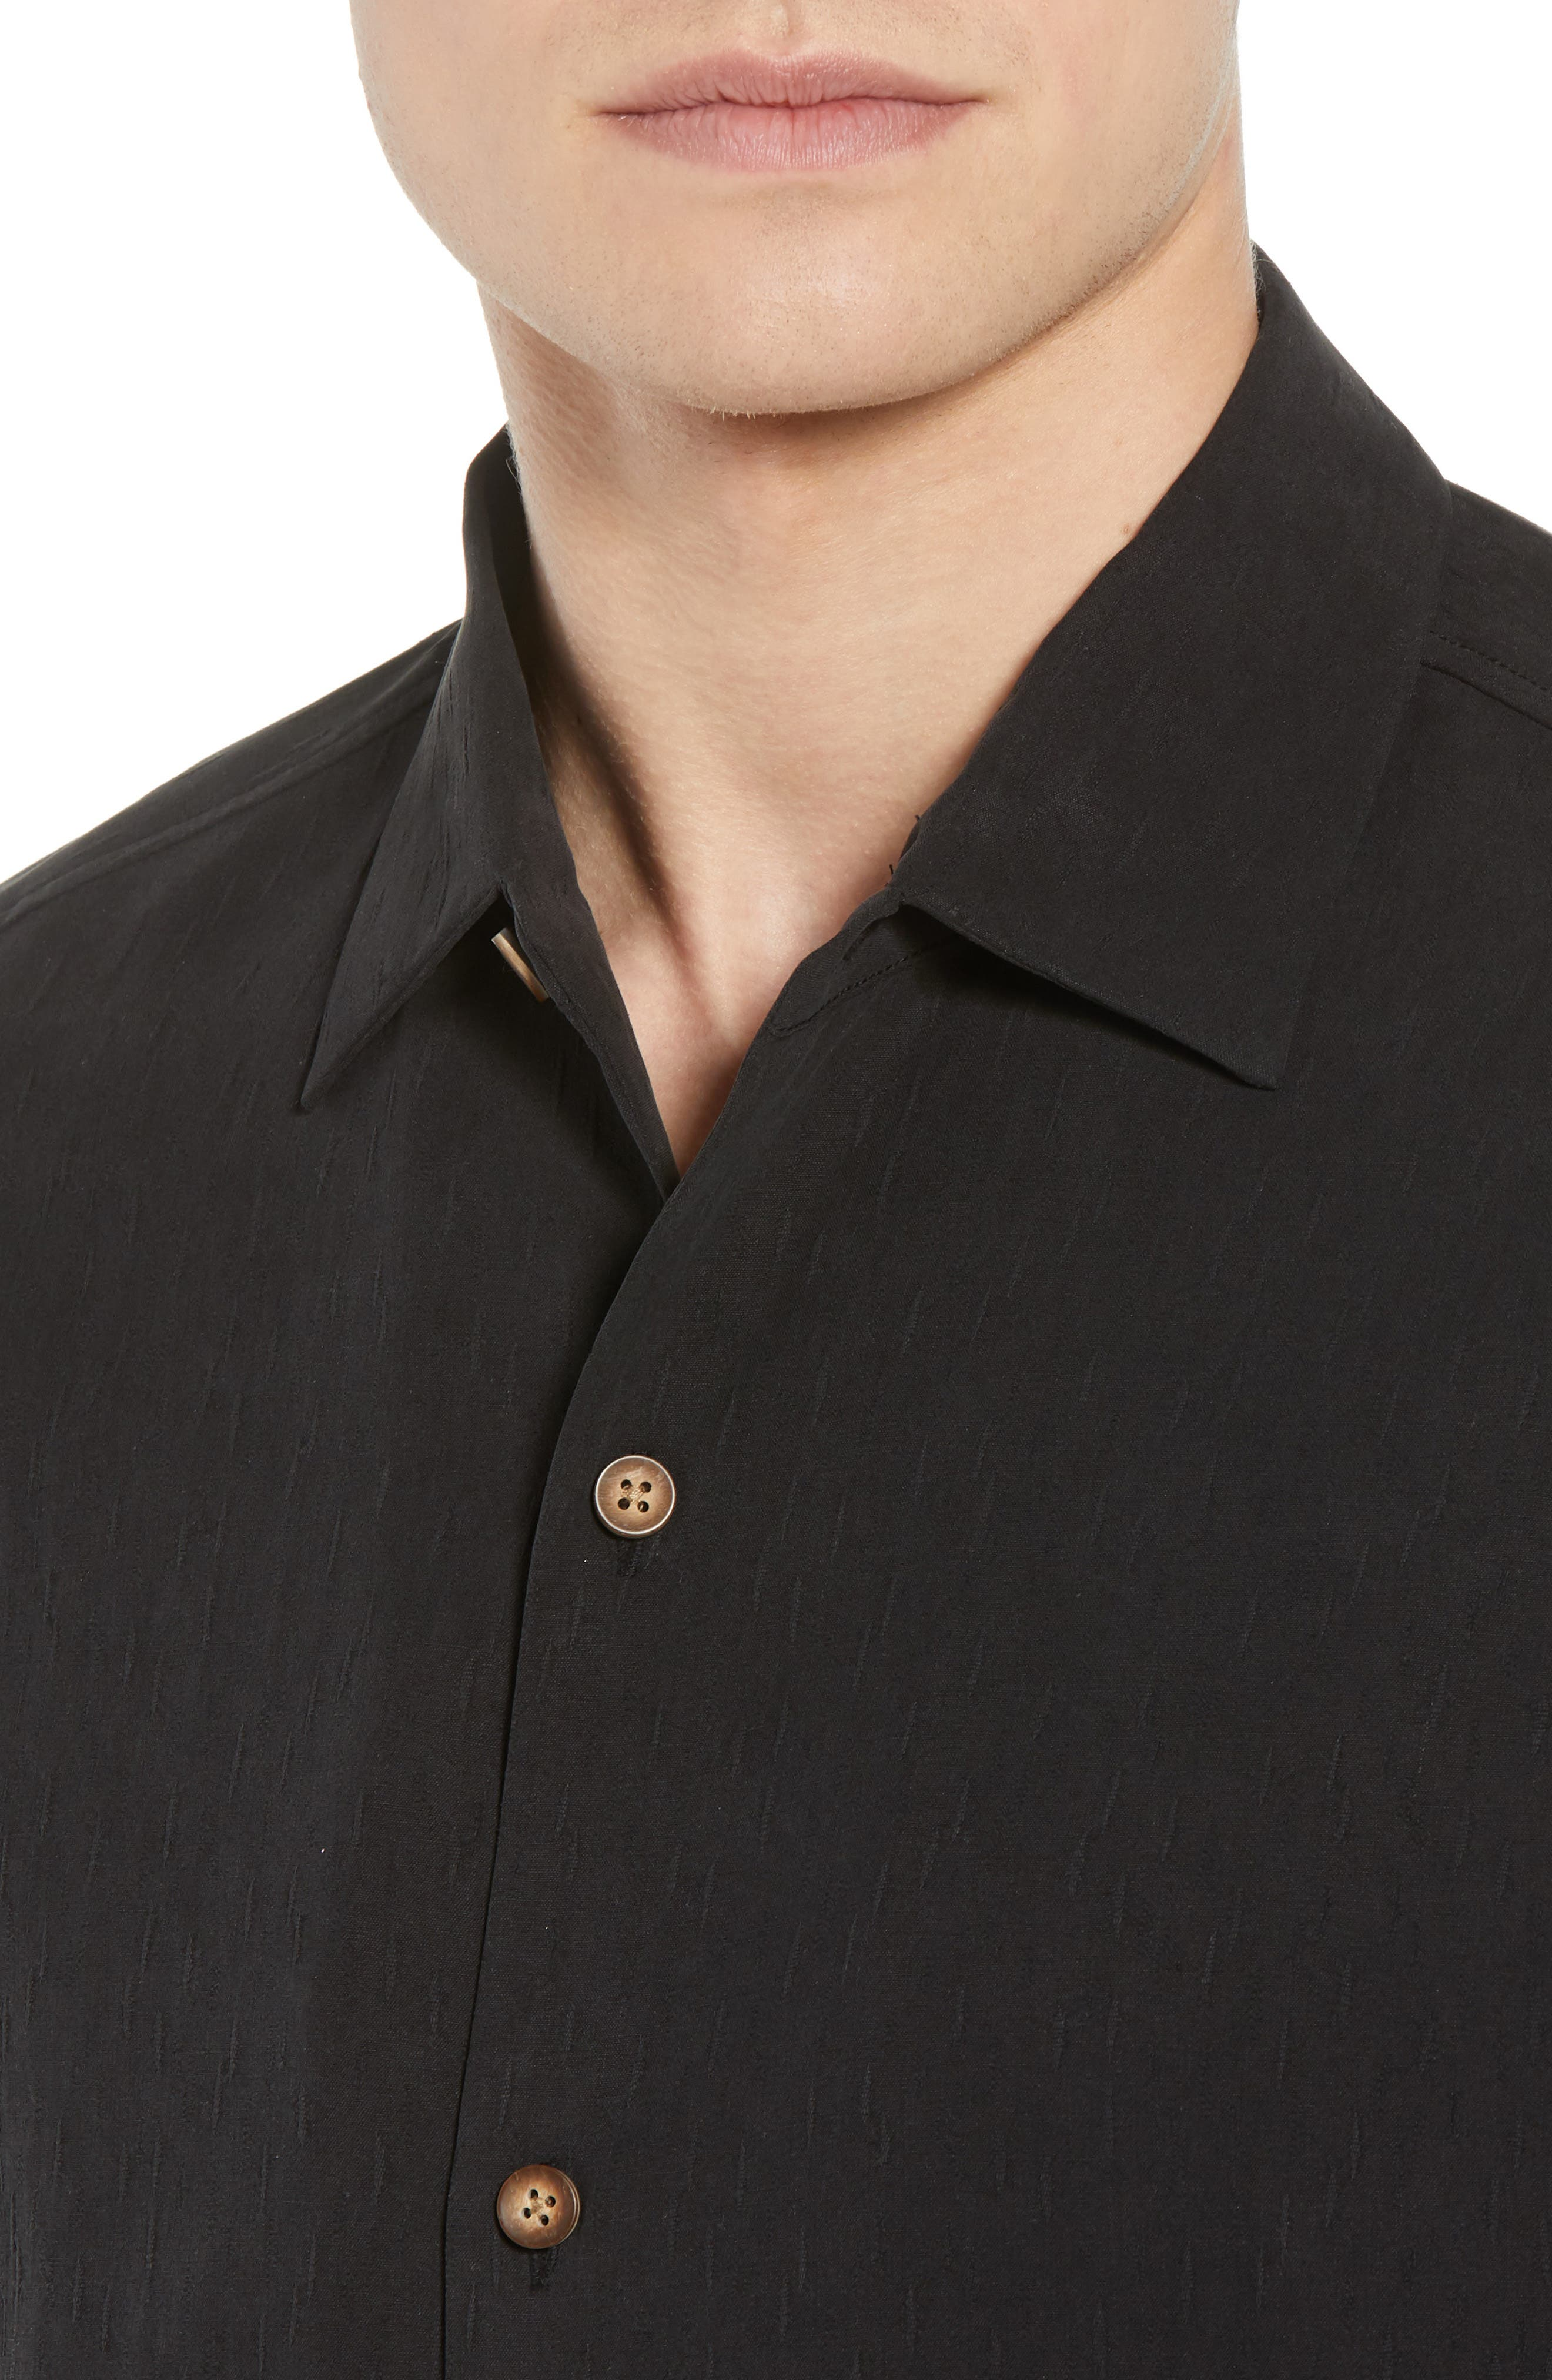 Bahama Reserve Silk Camp Shirt,                             Alternate thumbnail 2, color,                             Black